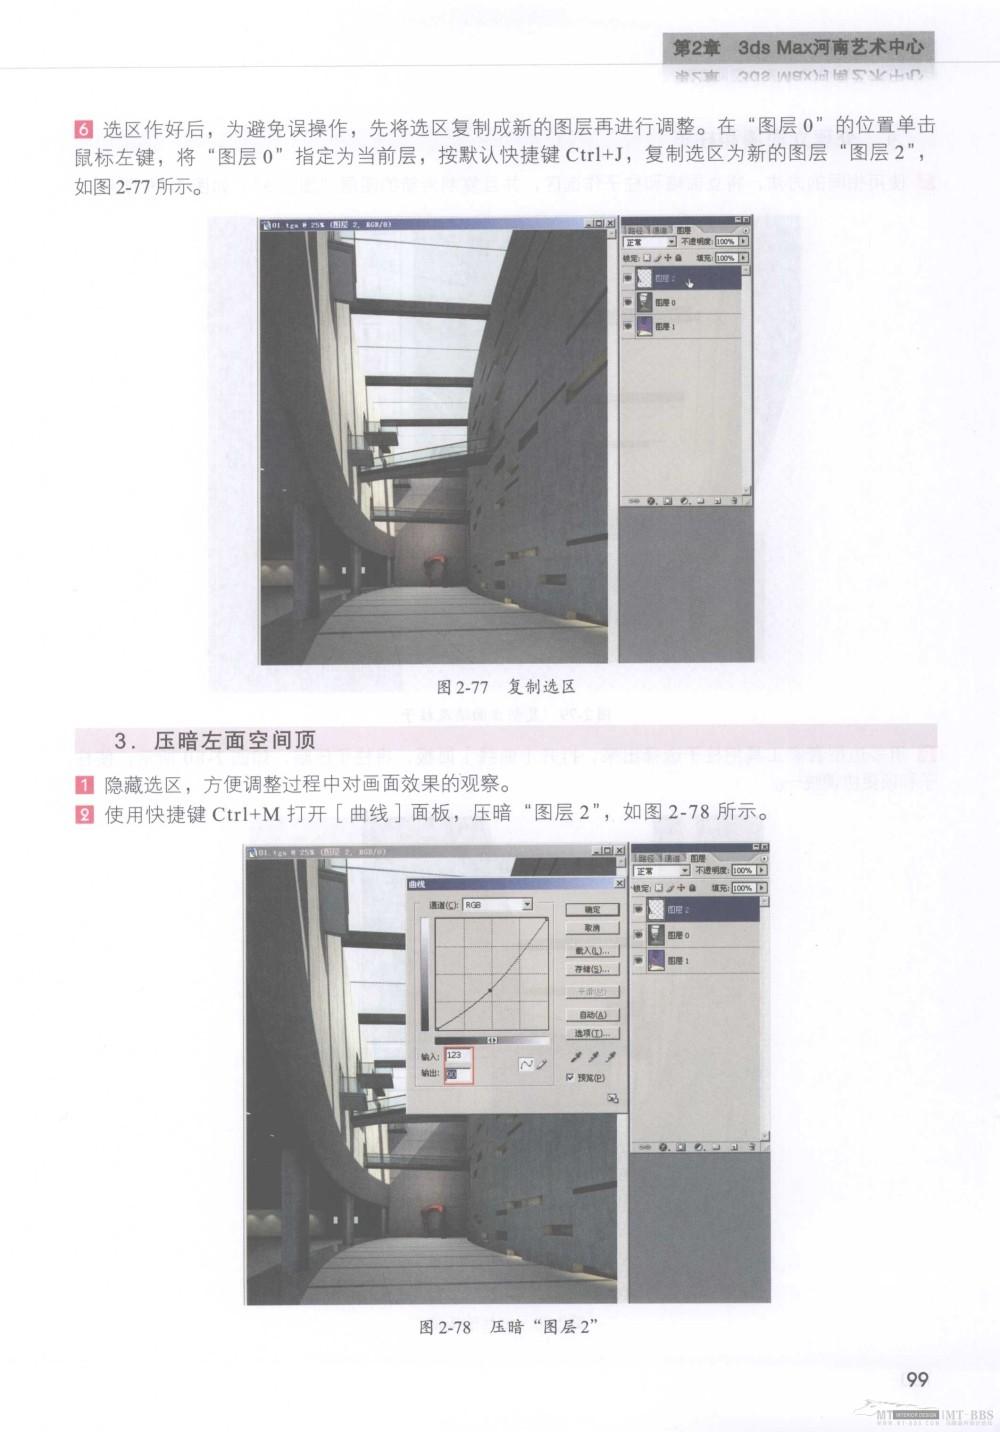 水晶石技法-3ds_Max&VRay室内空间表现_水晶石技法-3ds_Max&VRay室内空间表现_页面_105.jpg